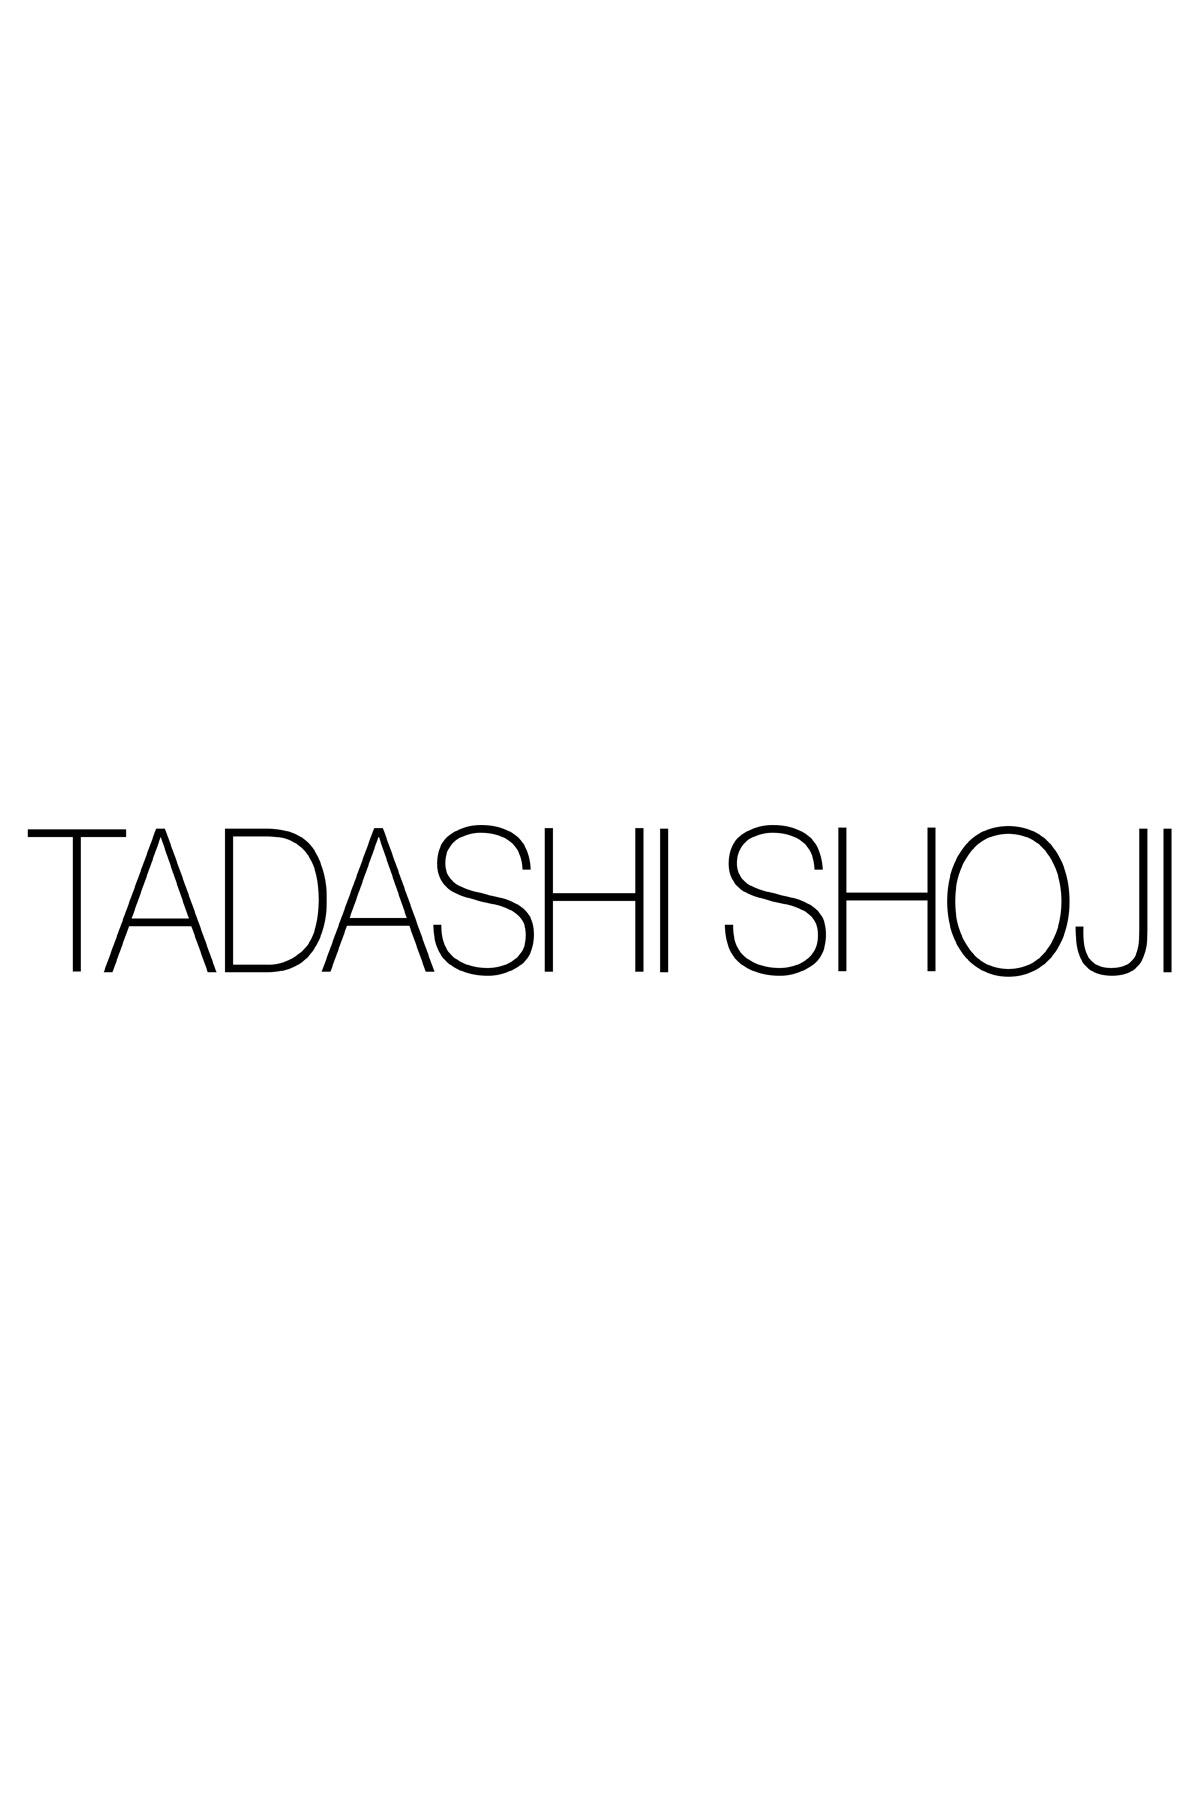 Tadashi Shoji - Sacco Sleeveless Sequin & Neoprene Dress - PLUS SIZE